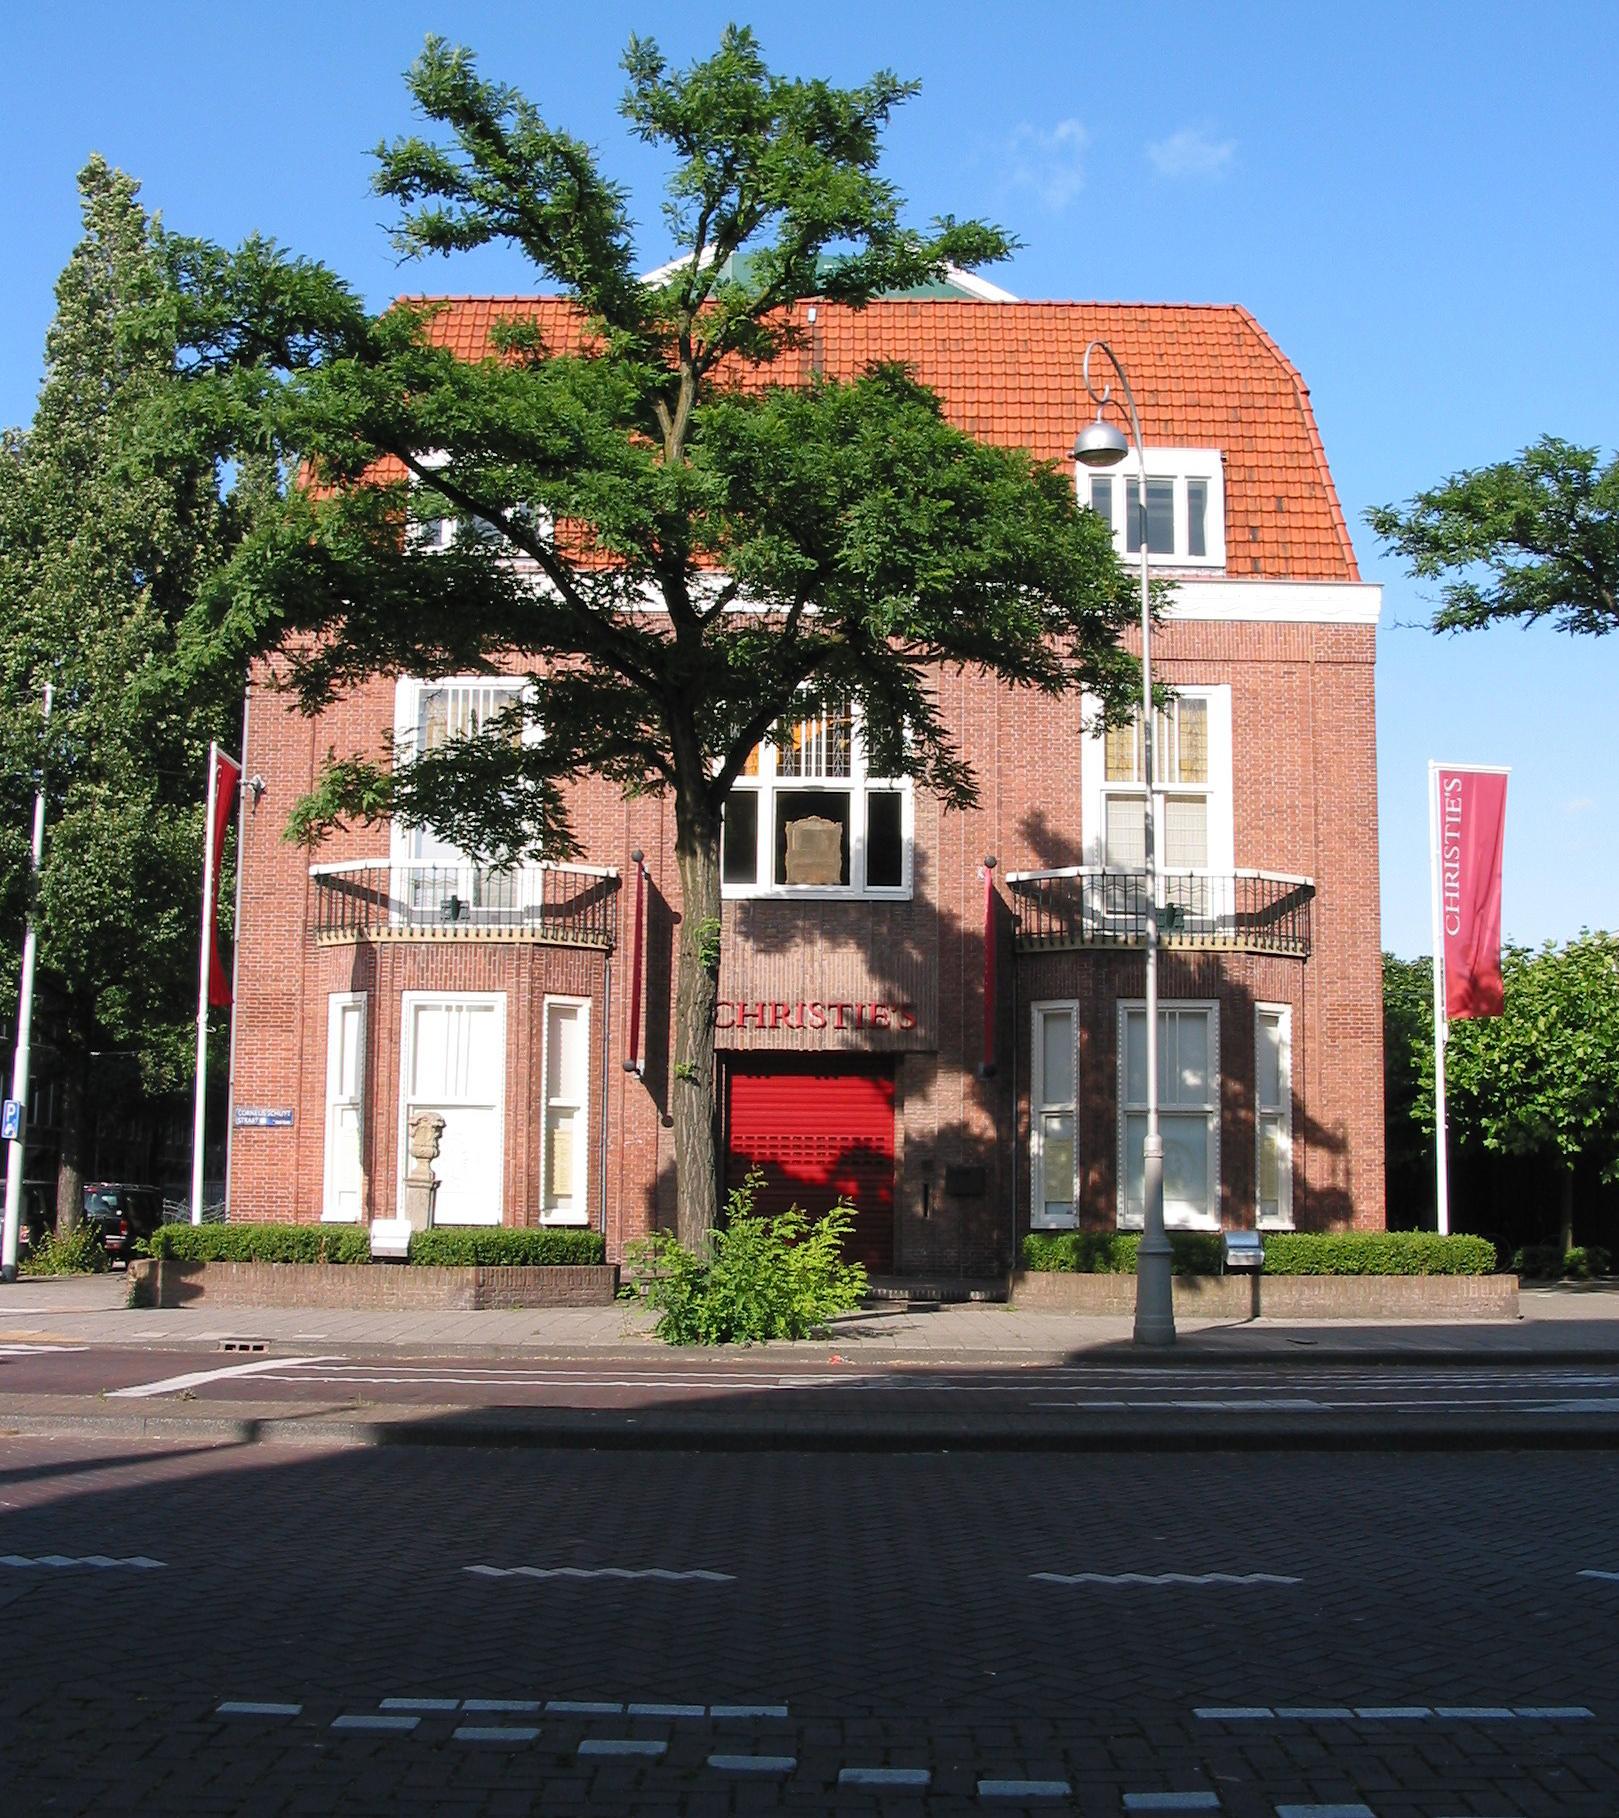 christies amsterdam